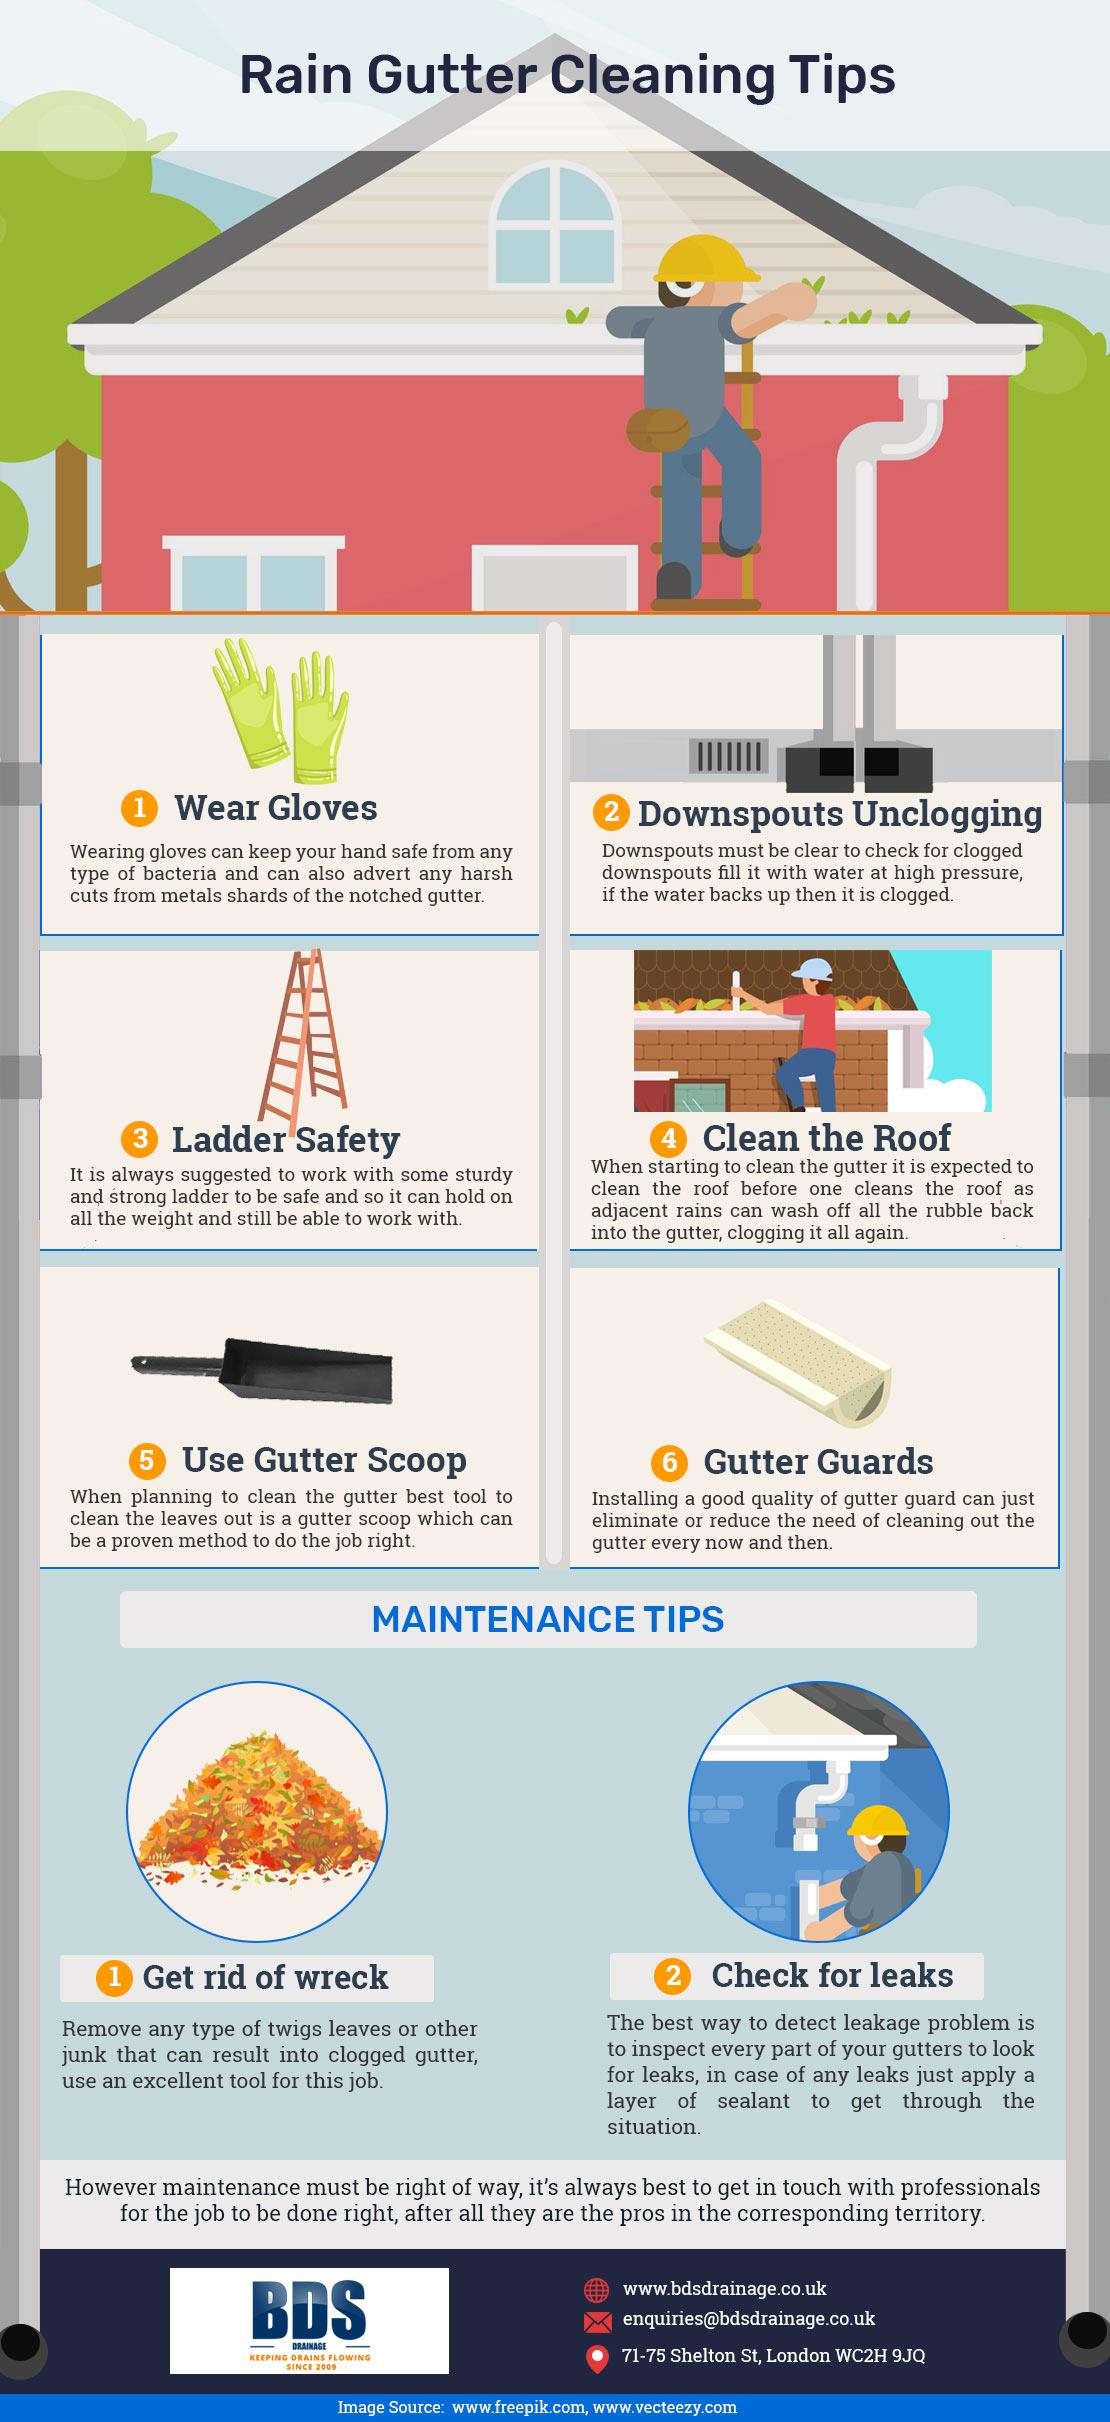 Rain Gutter Cleaning Tips